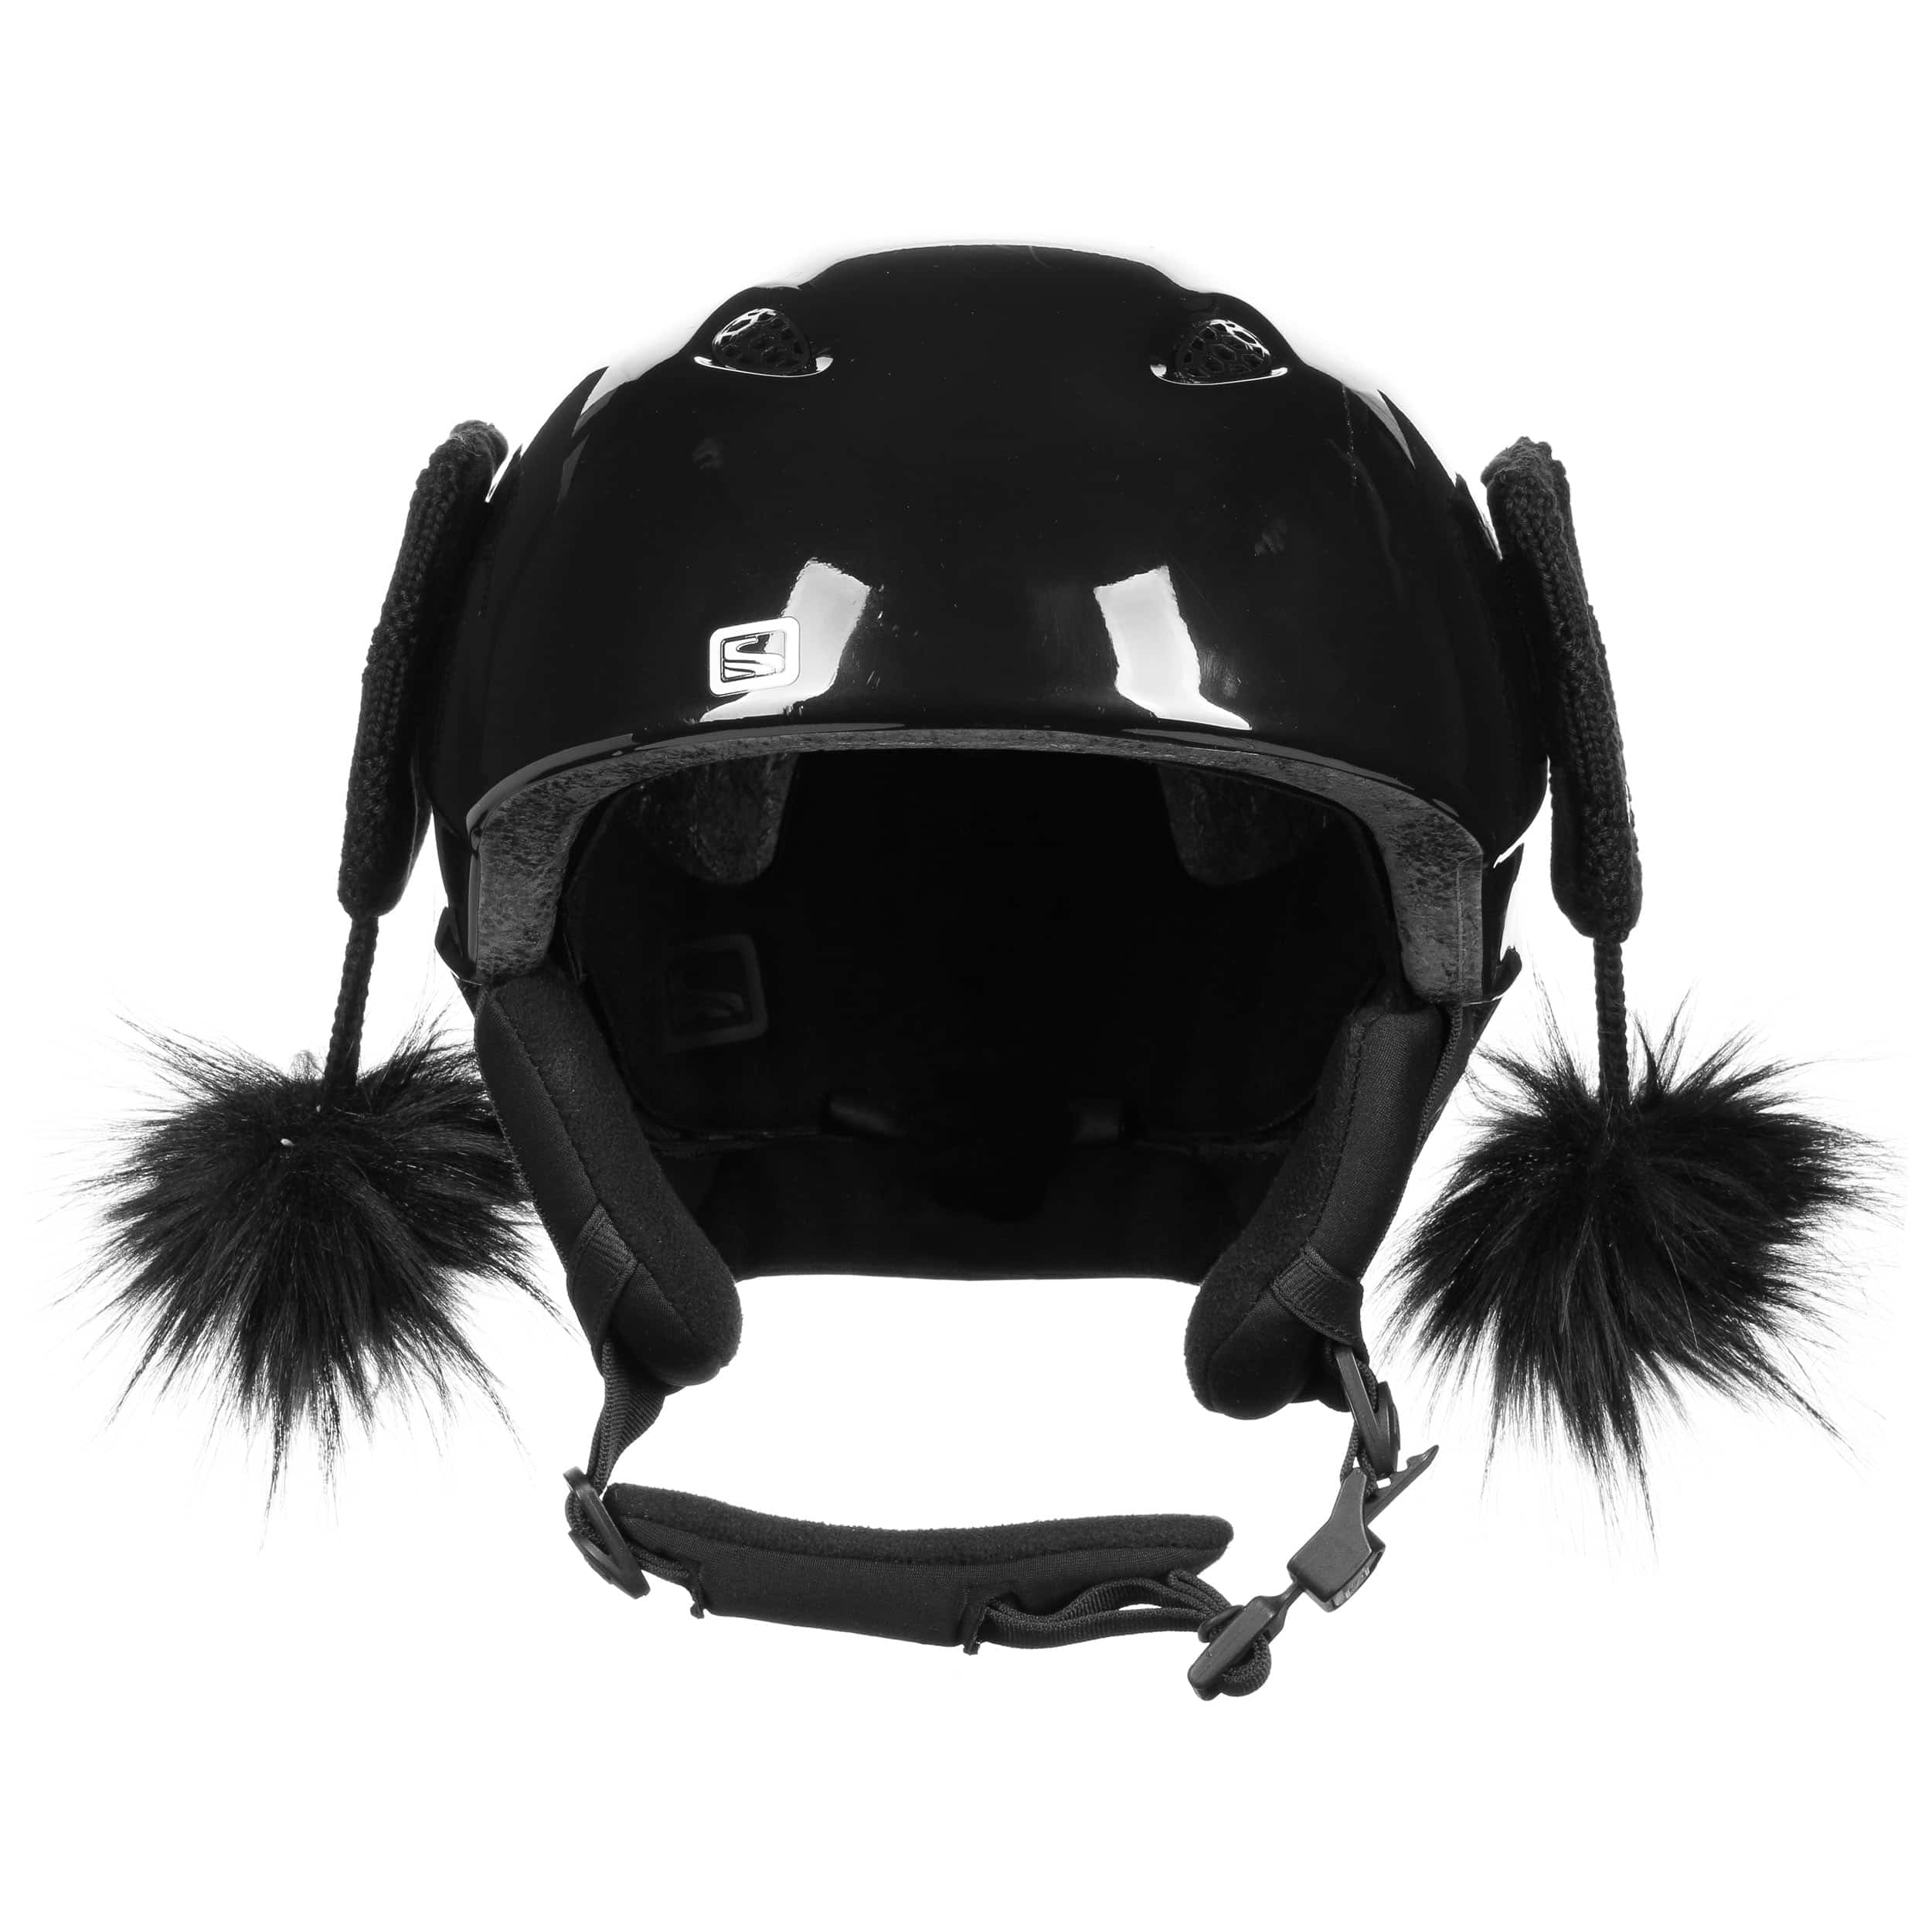 711aafc1979 Cowboy Hat Motorcycle Helmets   Ash Cycles